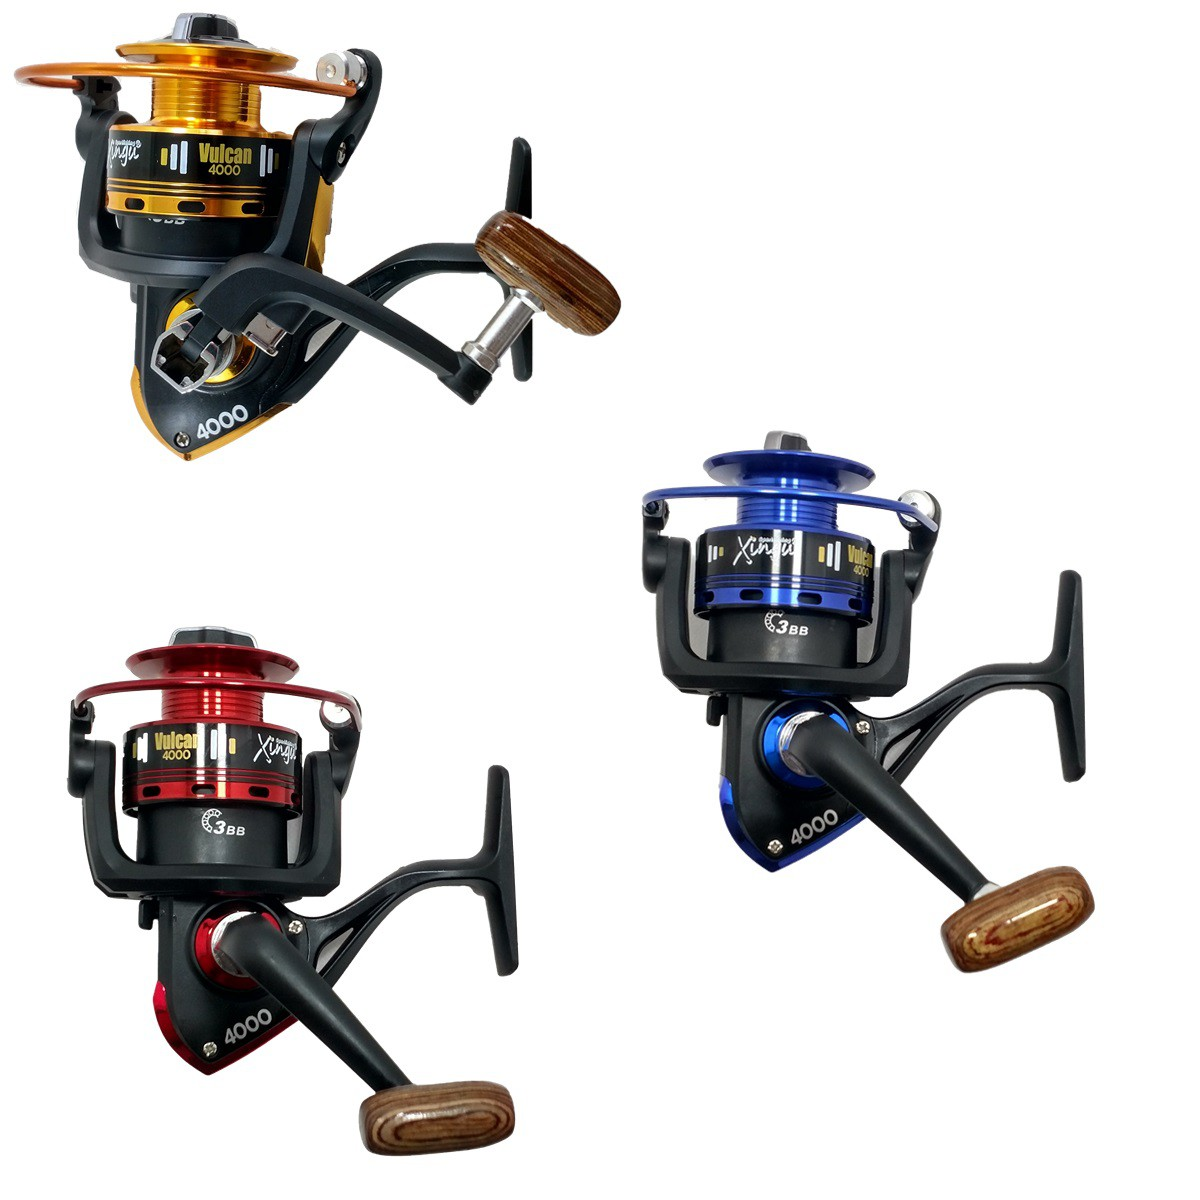 Kit De Pesca Completo 20kg 2 Vara 1,70m 2 Molinete 4000 E Itens